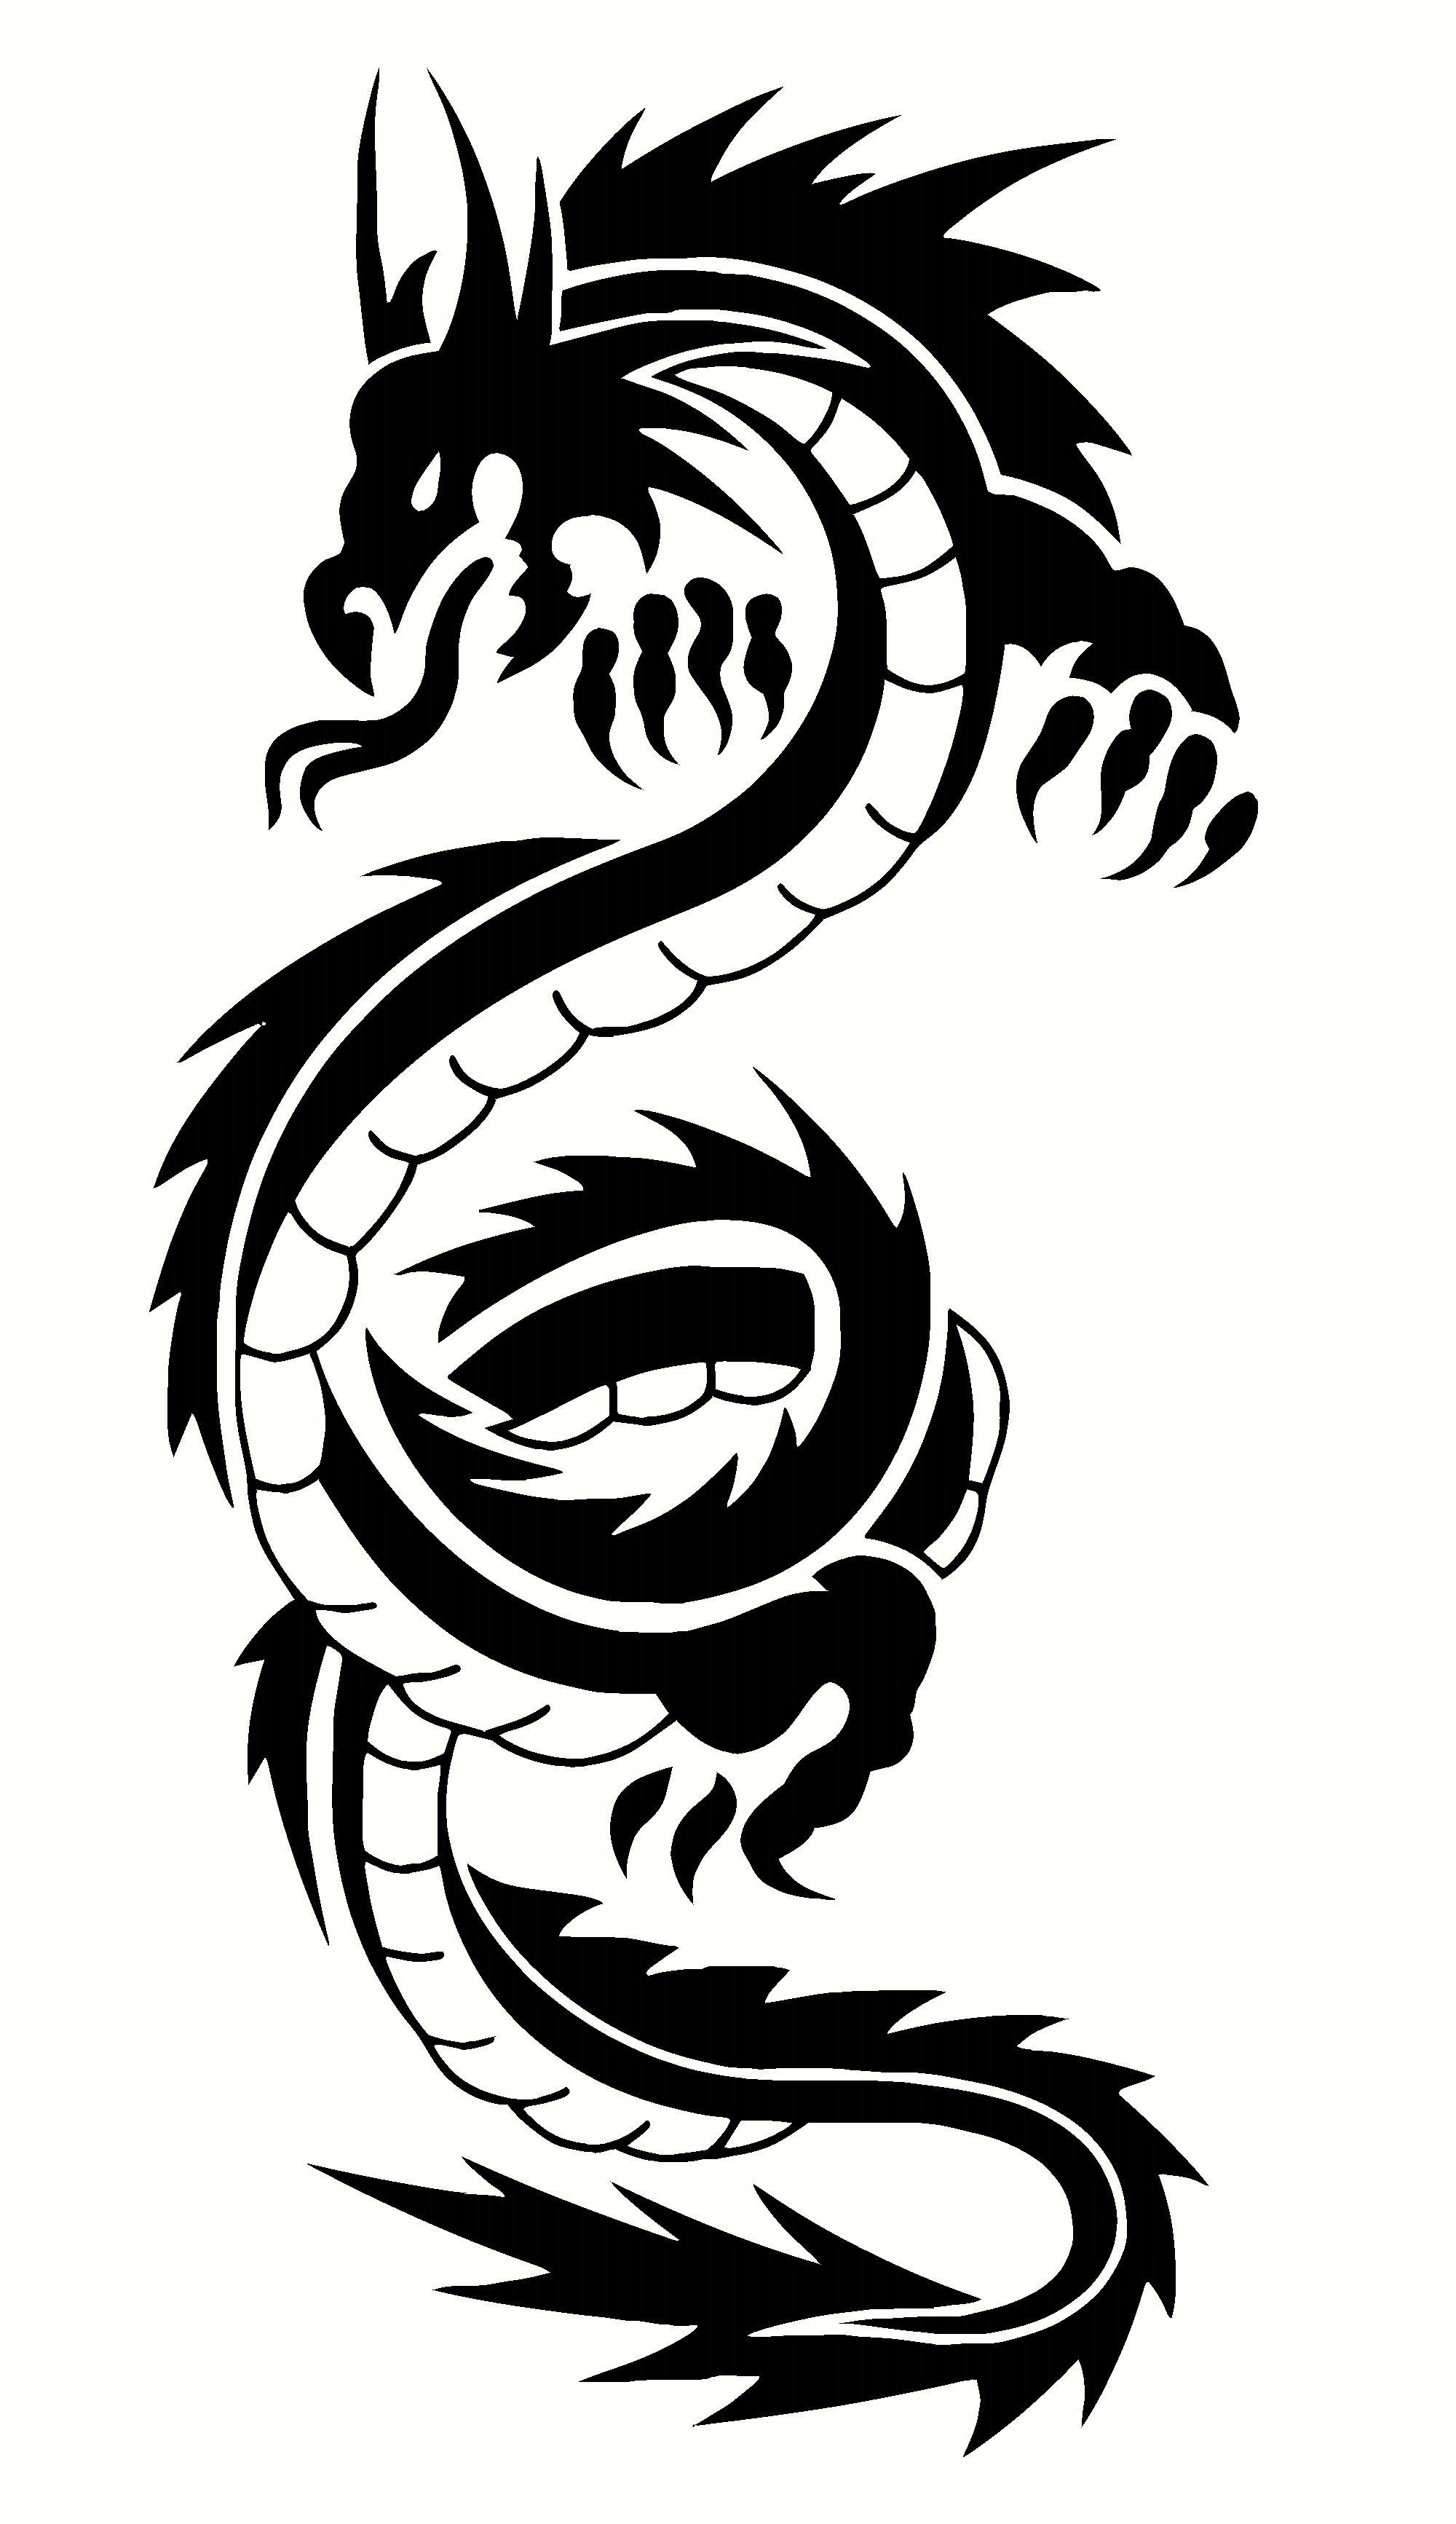 Welsh dragon tattoo designs - Chinese Dragon Tattoo Design Idea I Would Love This Tattoo